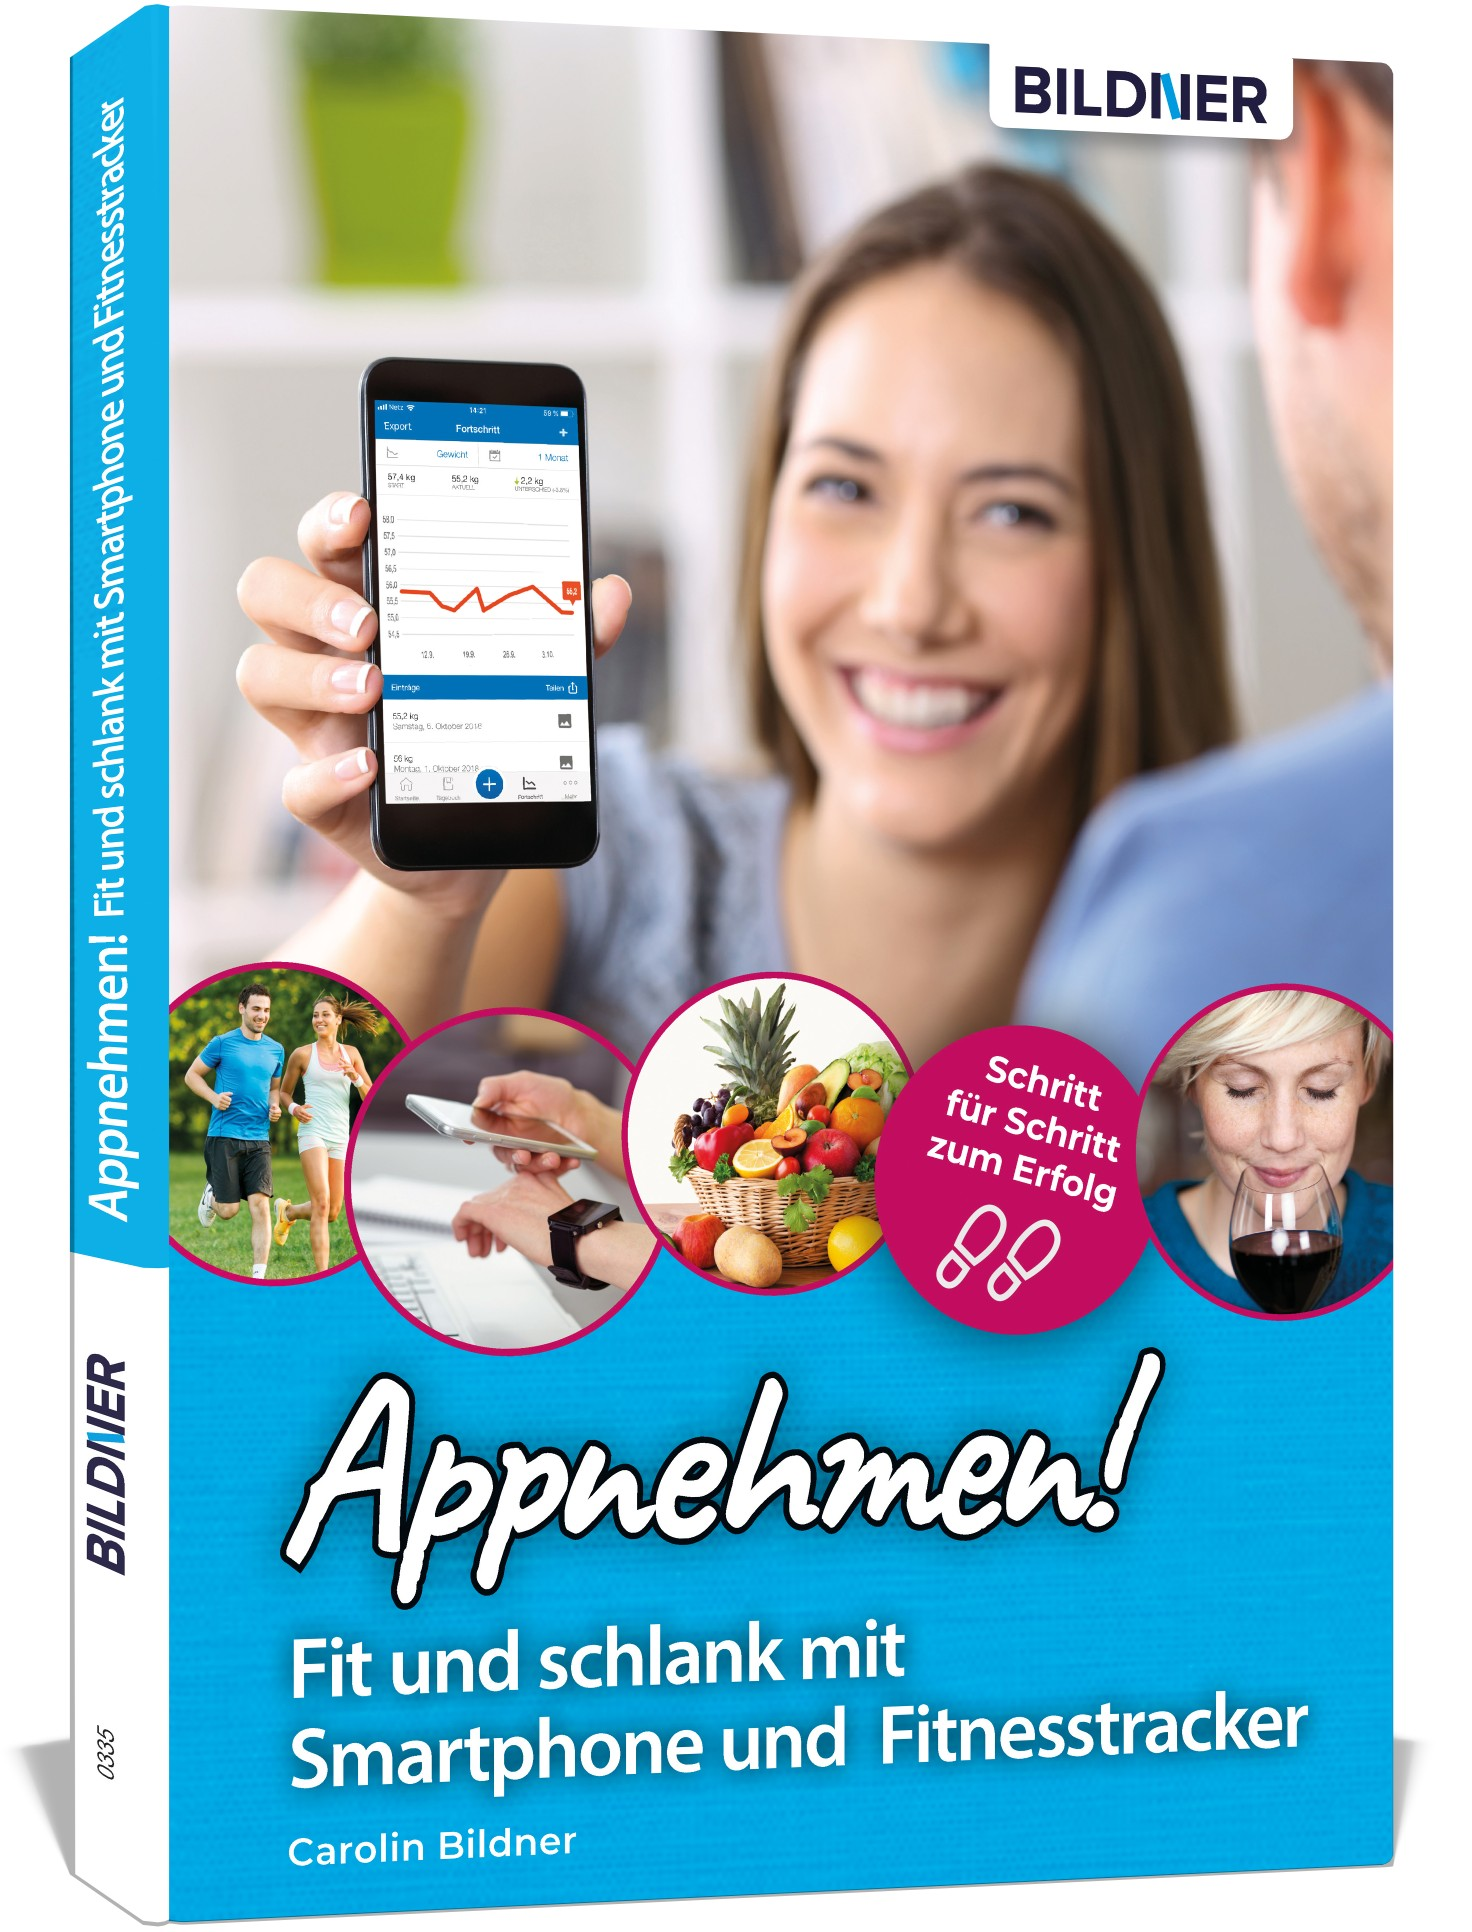 NEU Appnehmen! Fit und schlank mit Smartphone & Fitnesstracker Caroli... 803148